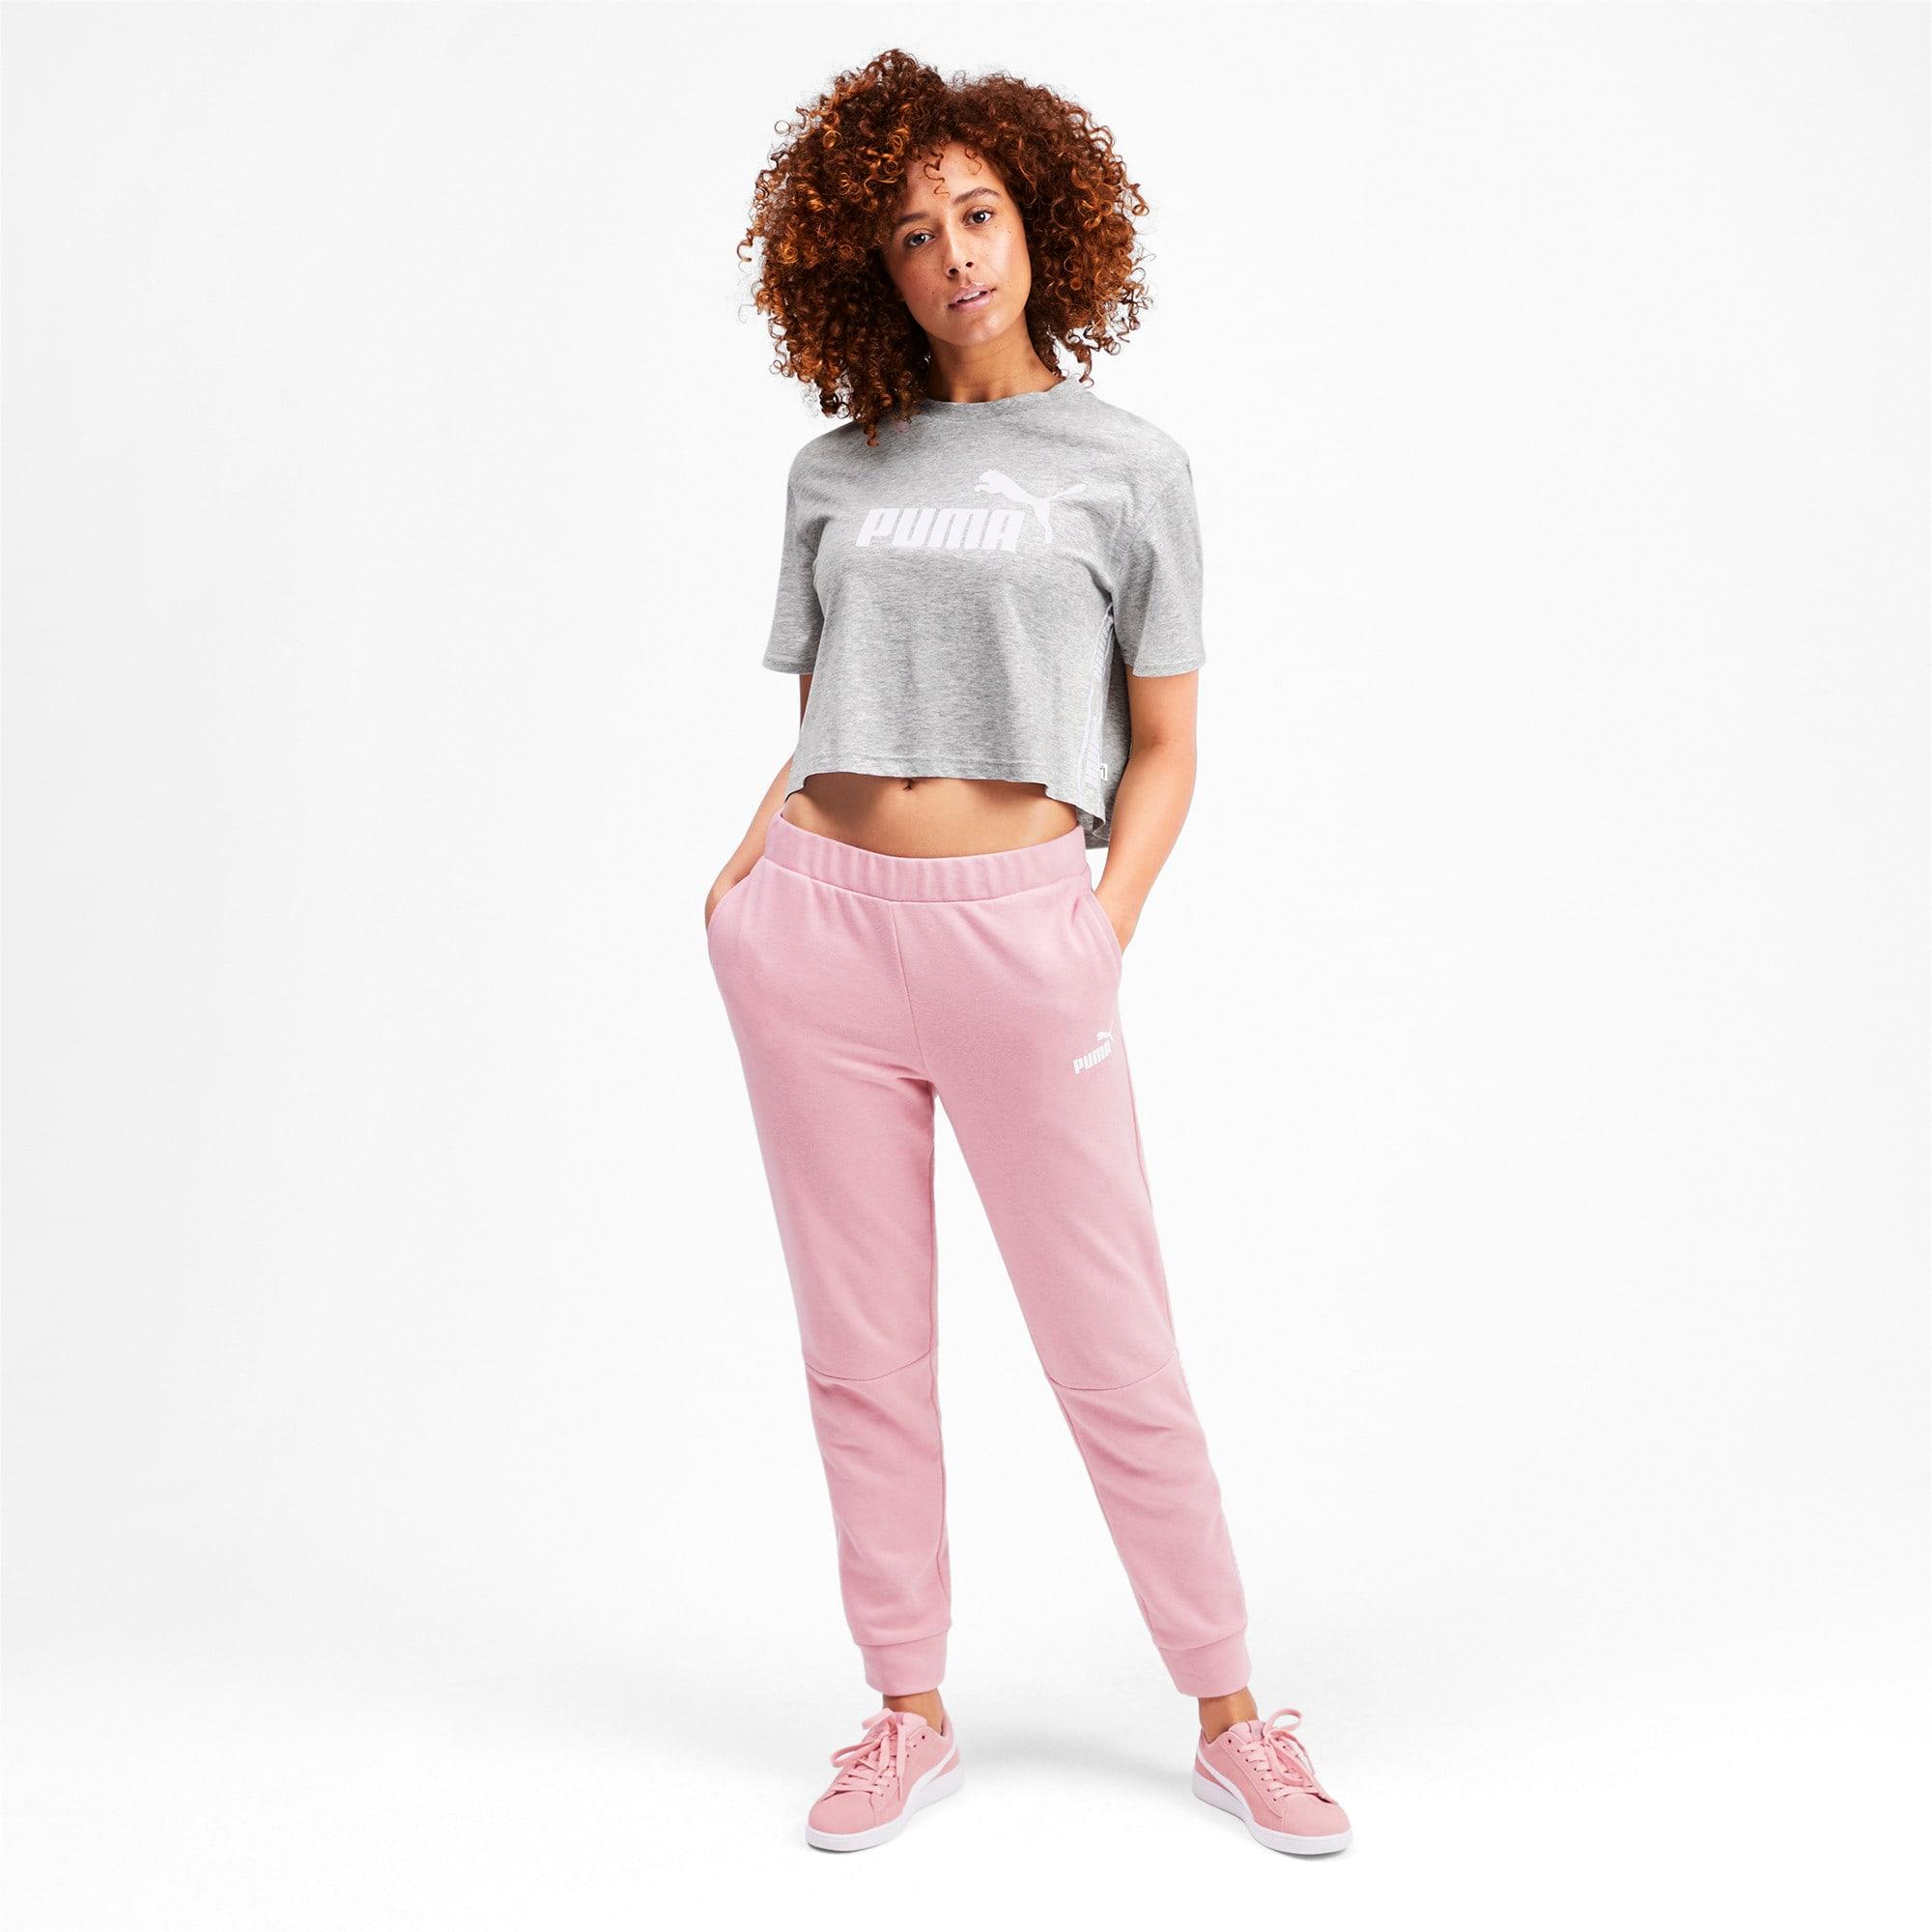 Miniatura 4 de Camiseta corta Amplified para mujer, Light Gray Heather, mediano